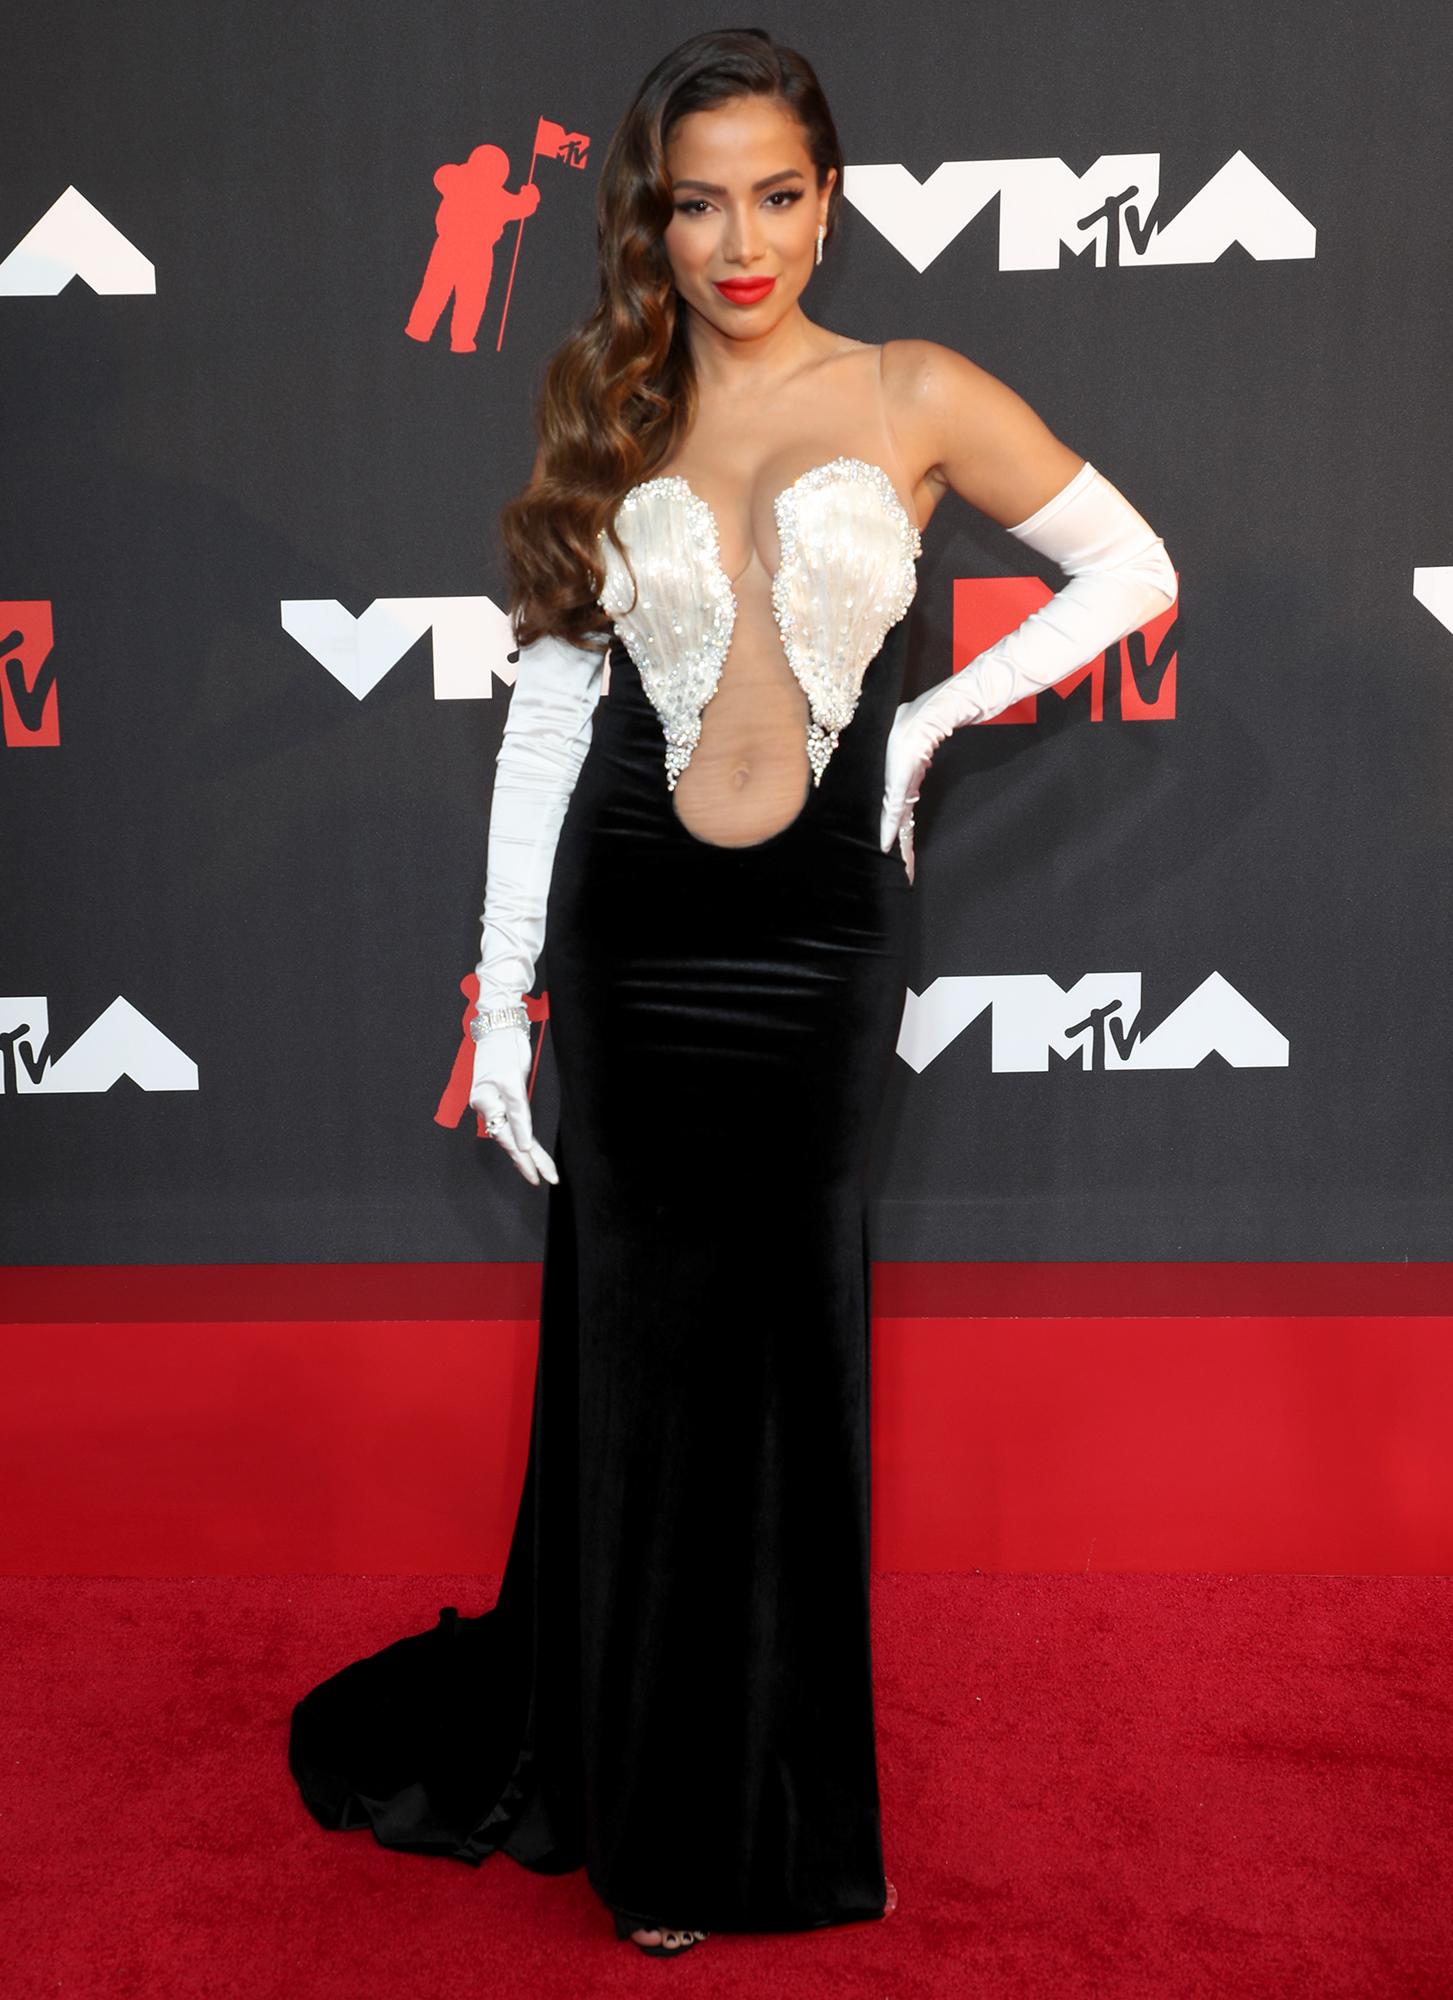 Anitta arrives at the 2021 MTV Video Music Awards